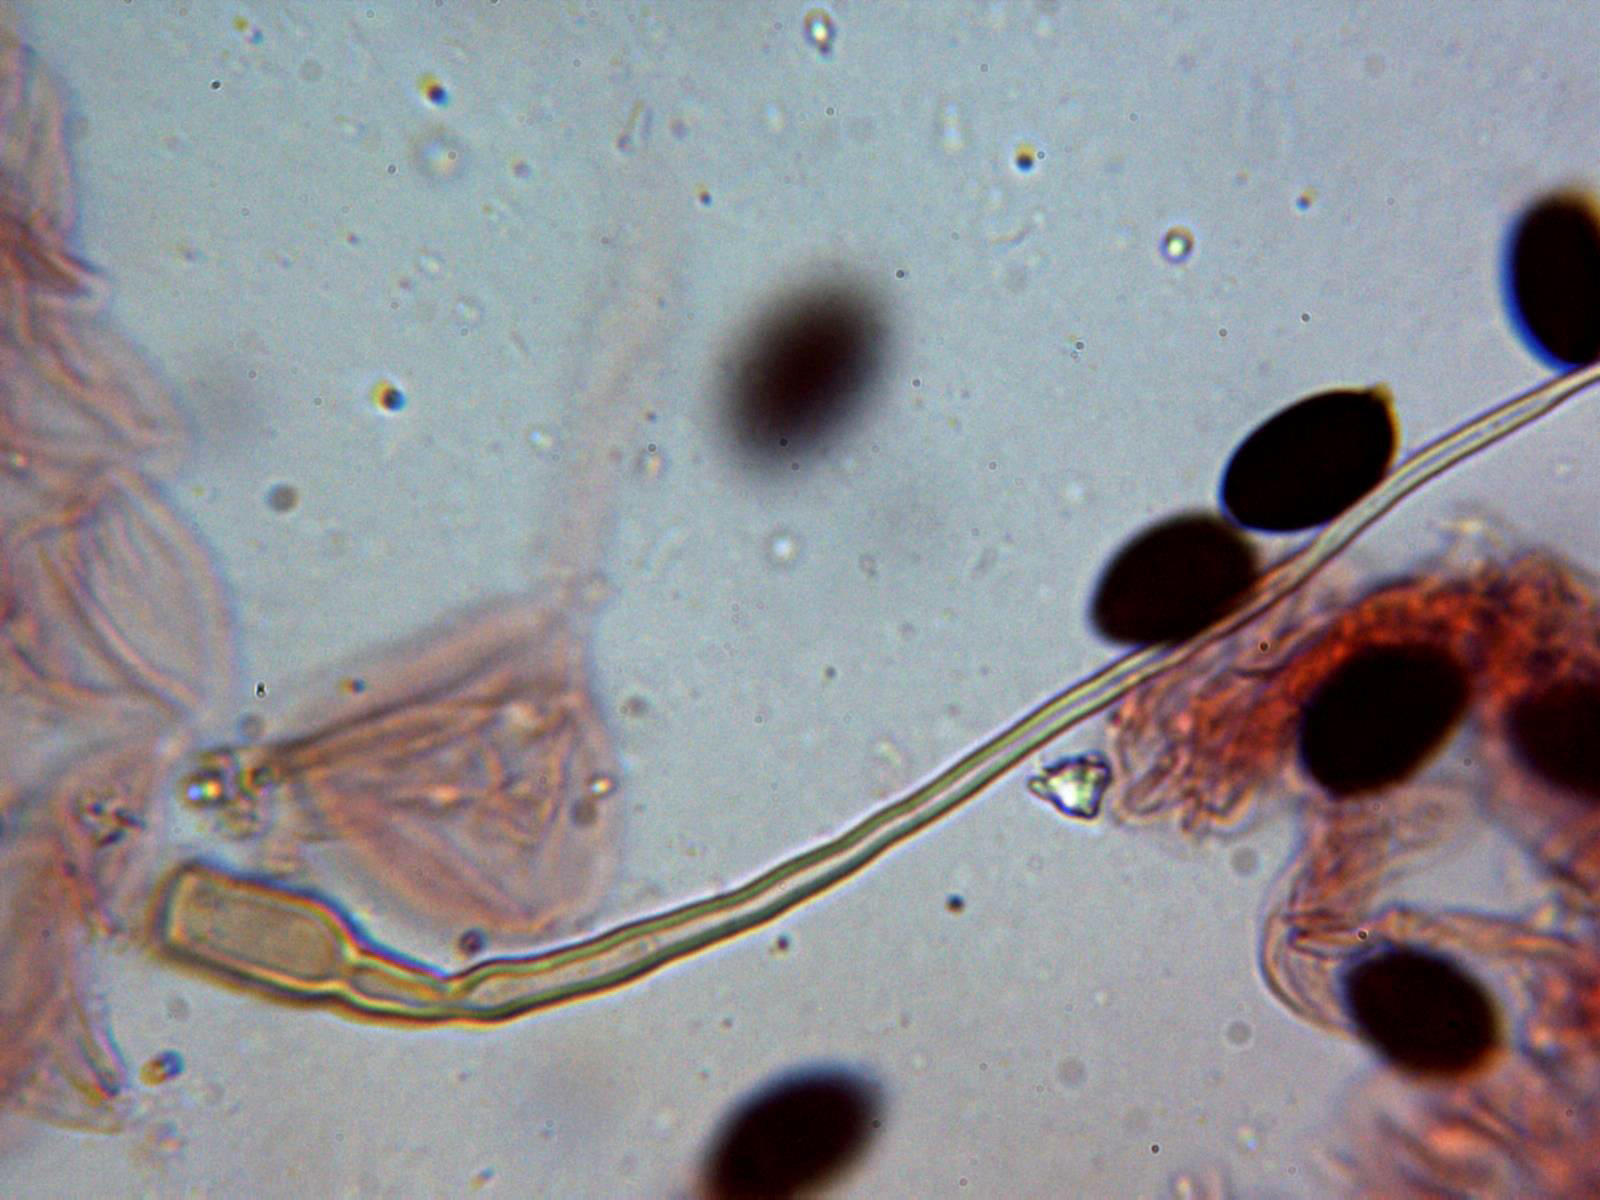 Pileocistidio1.jpg